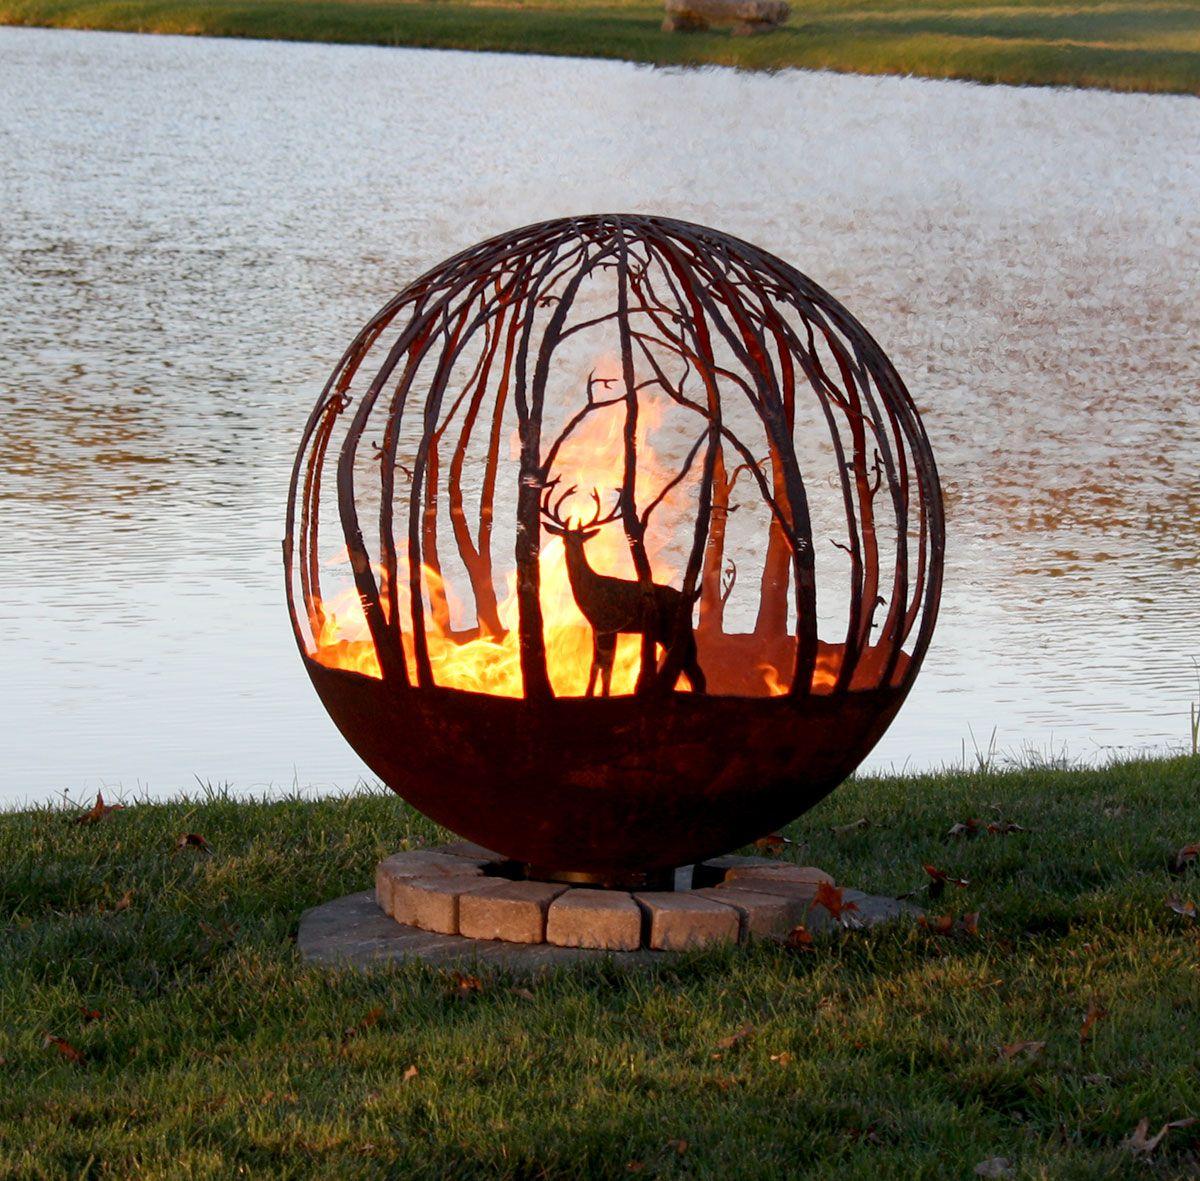 Winter woods fire pit sphere